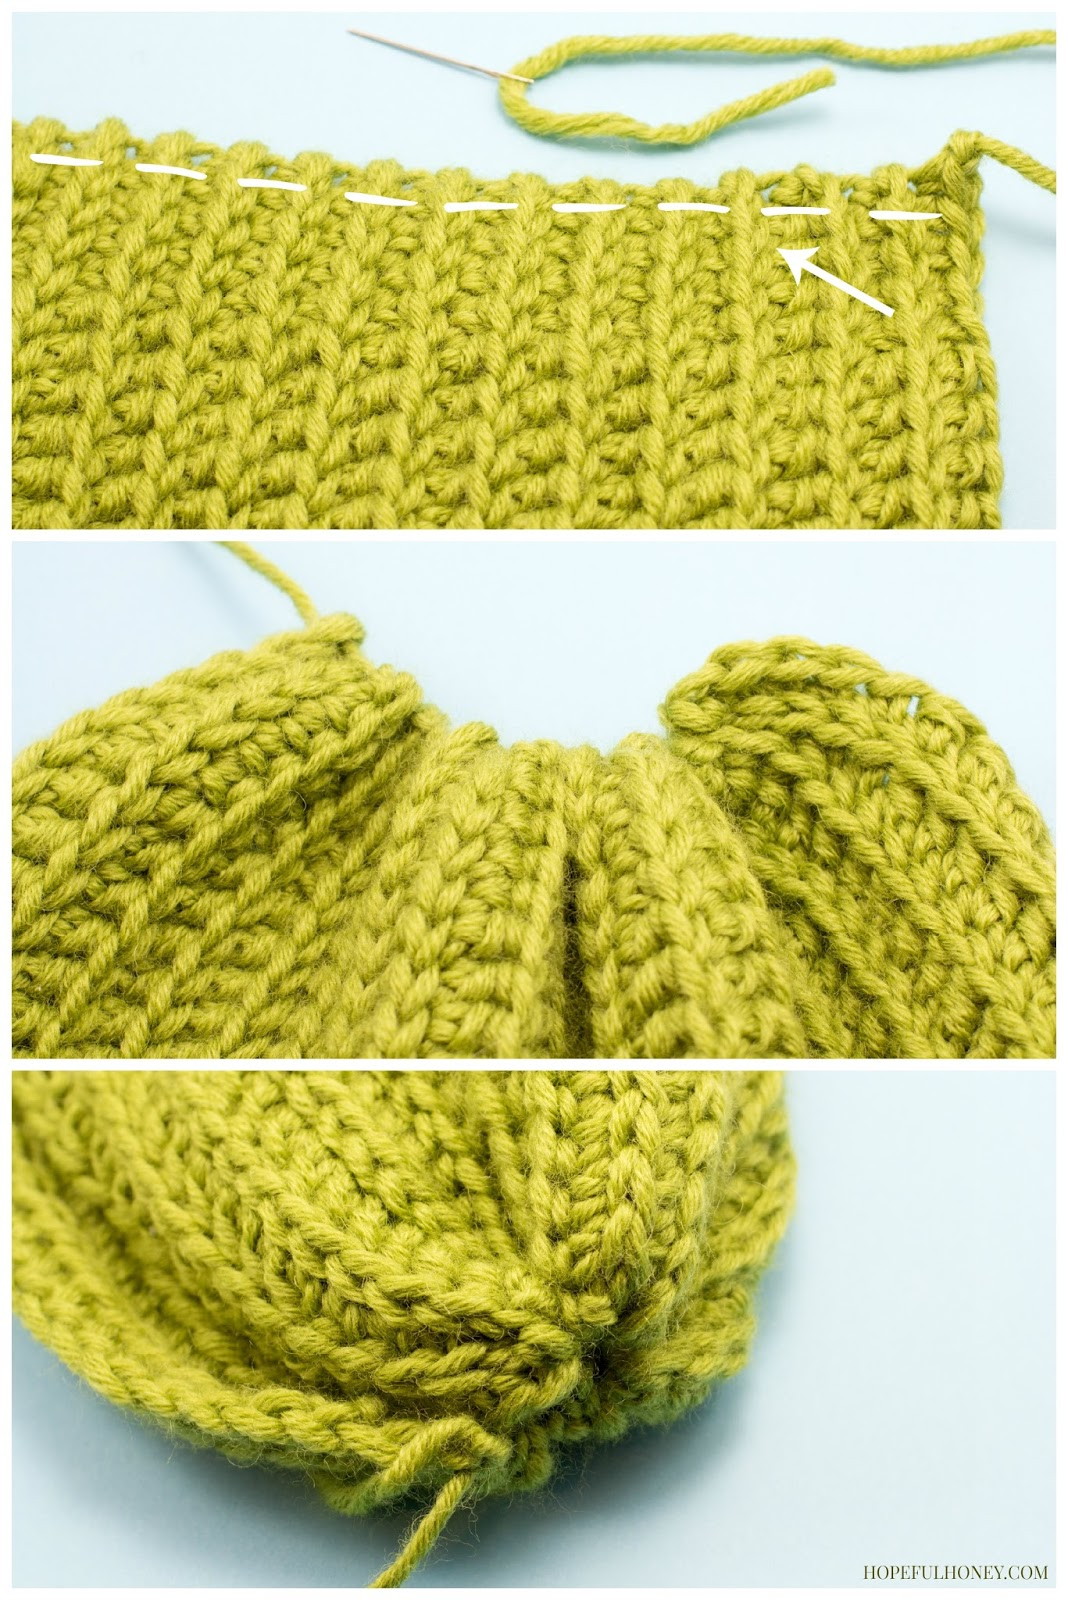 Hopeful Honey Craft Crochet Create